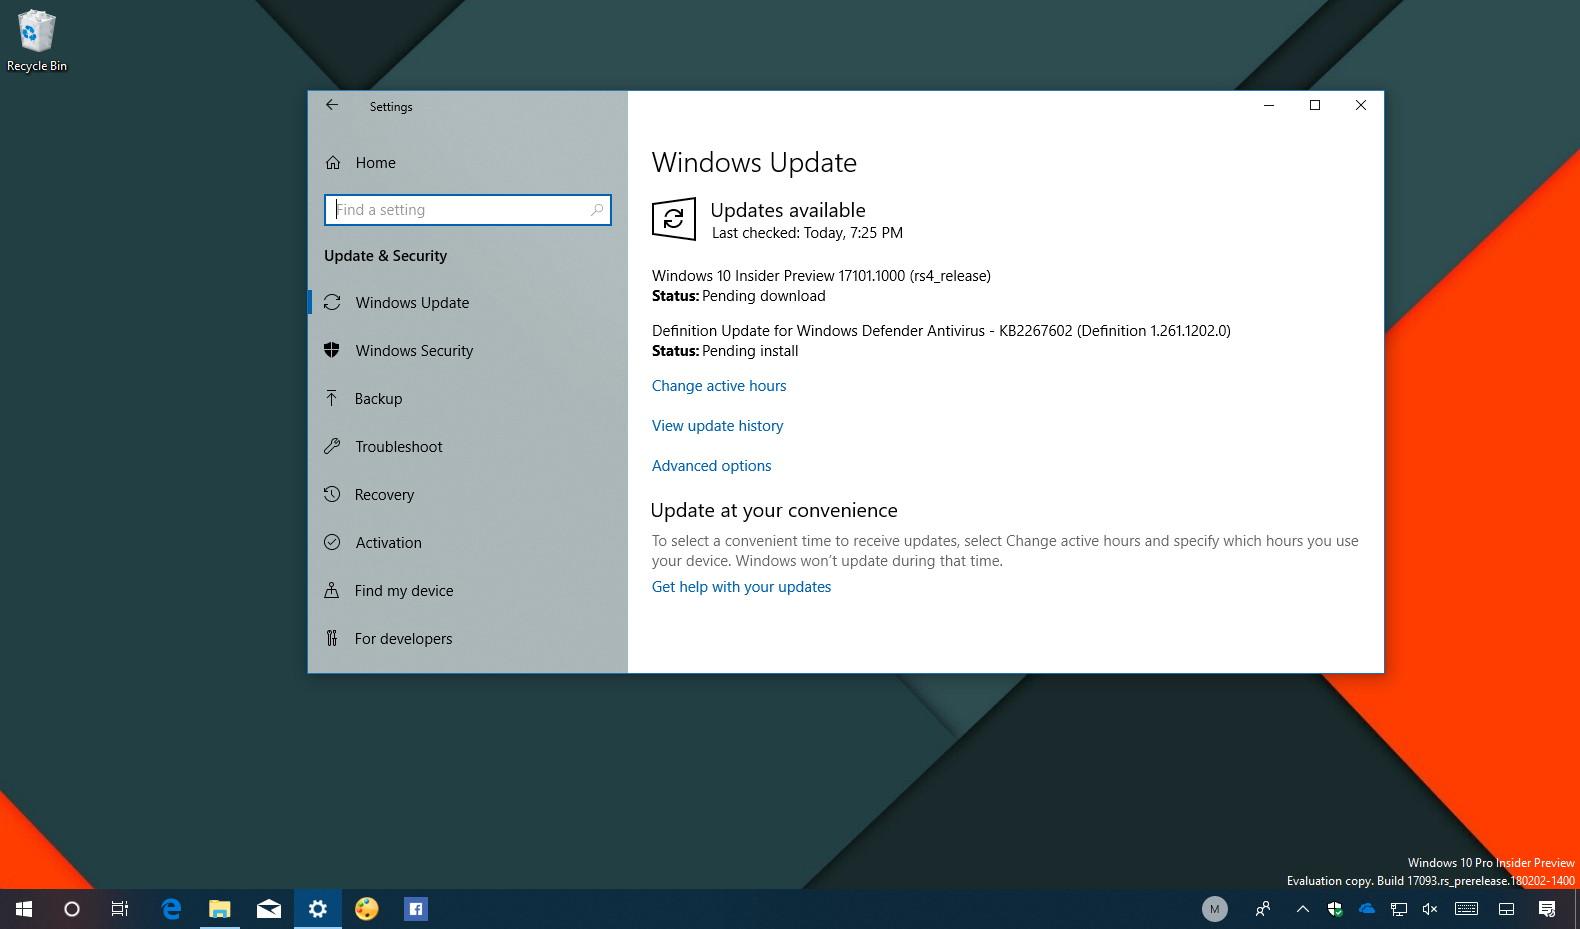 Windows 10 build 17101